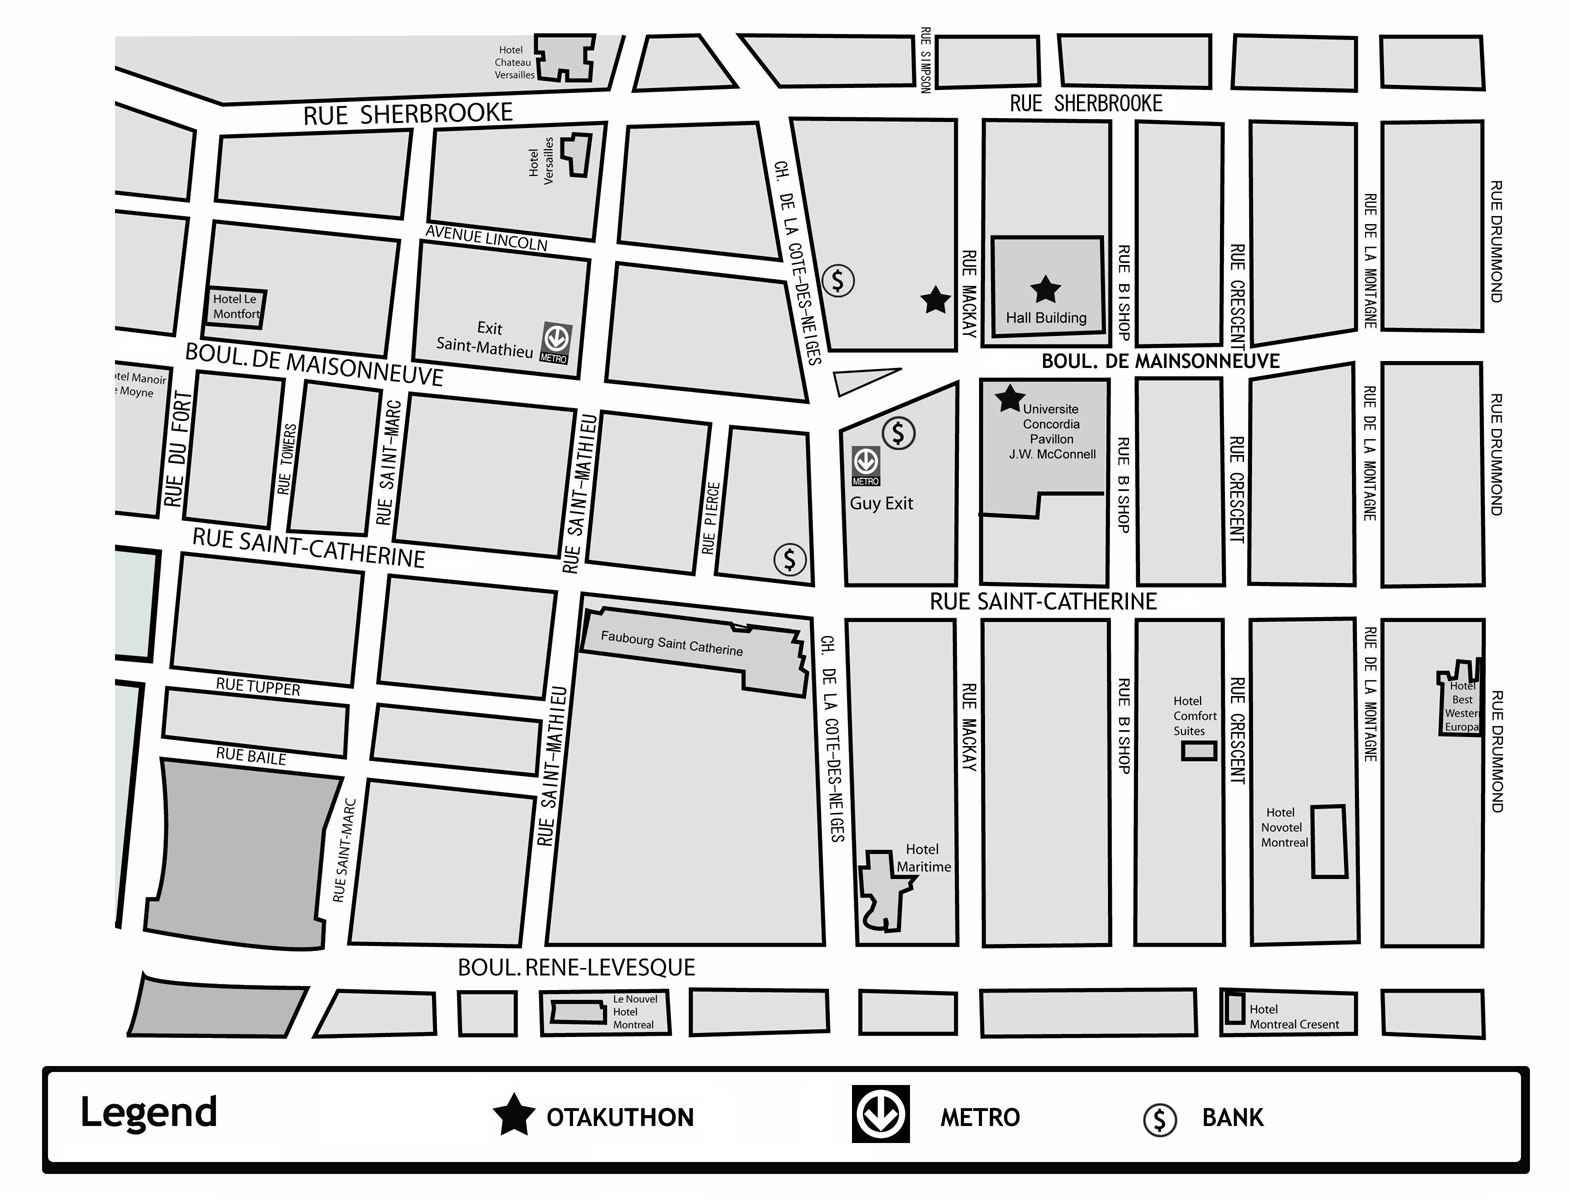 Otakuthon 2007 location msn local live maps to concordia university larger area map google maps publicscrutiny Images